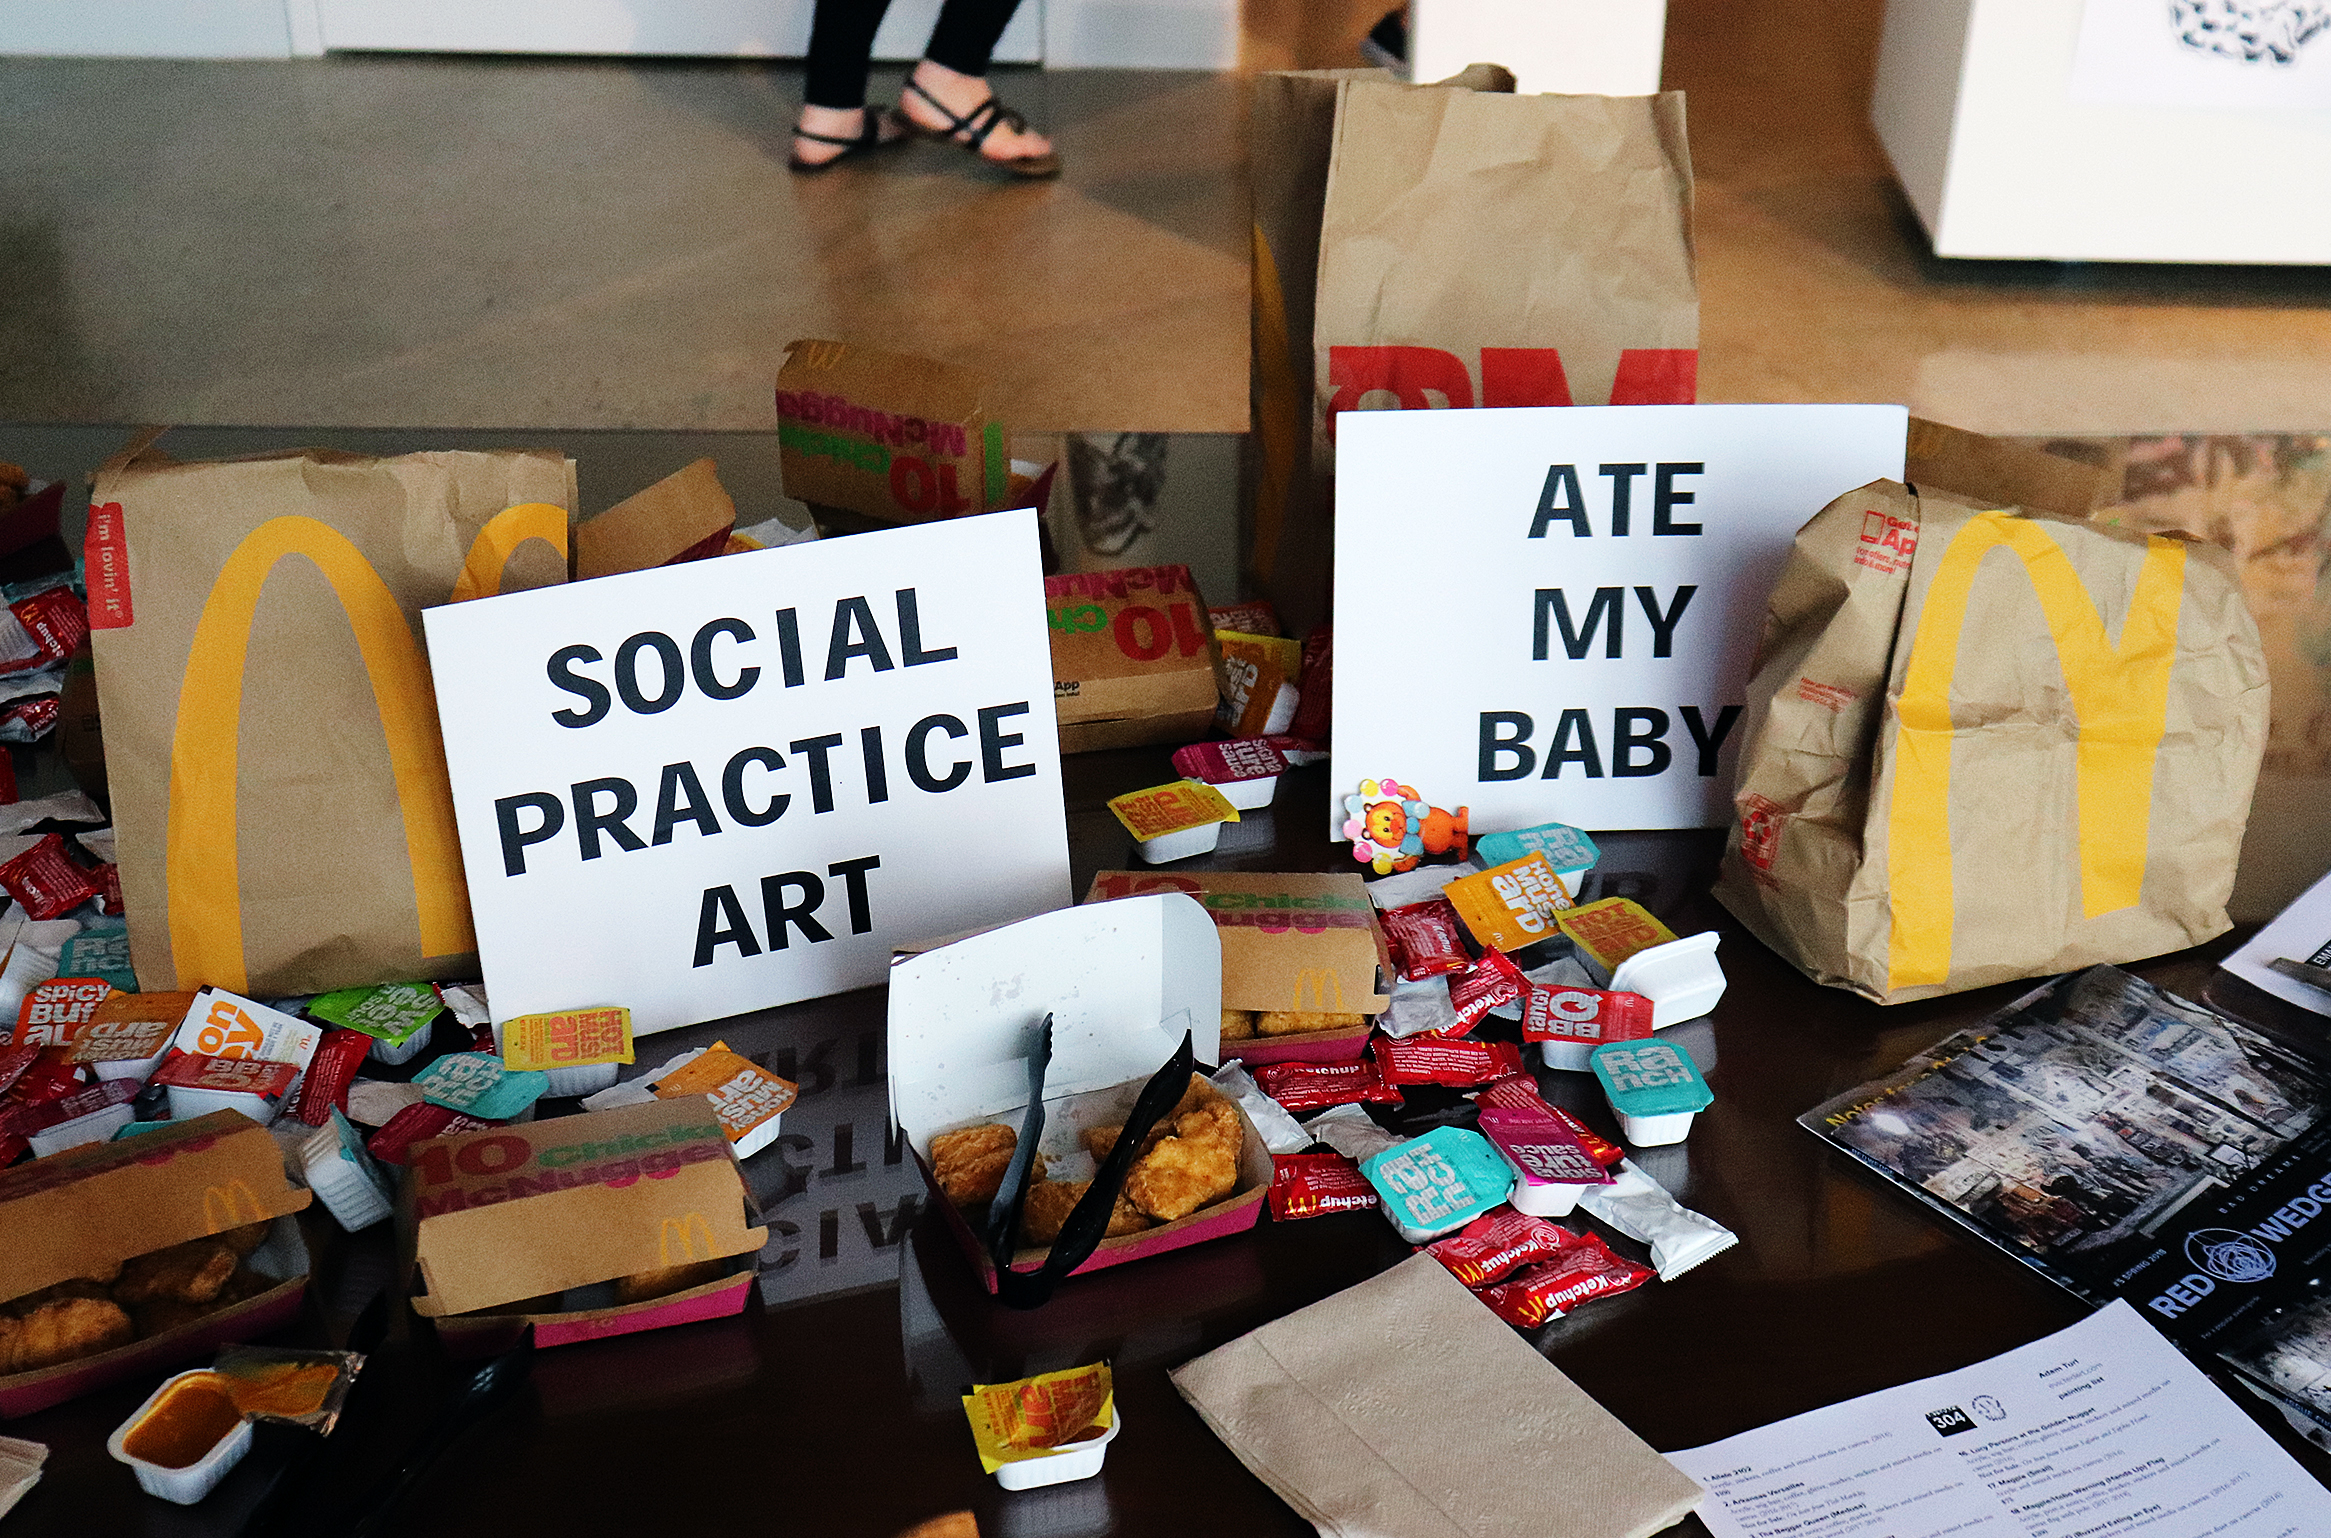 Social Practice Art Ate My Baby  (Artspace 304) (2018). (Adam Turl)